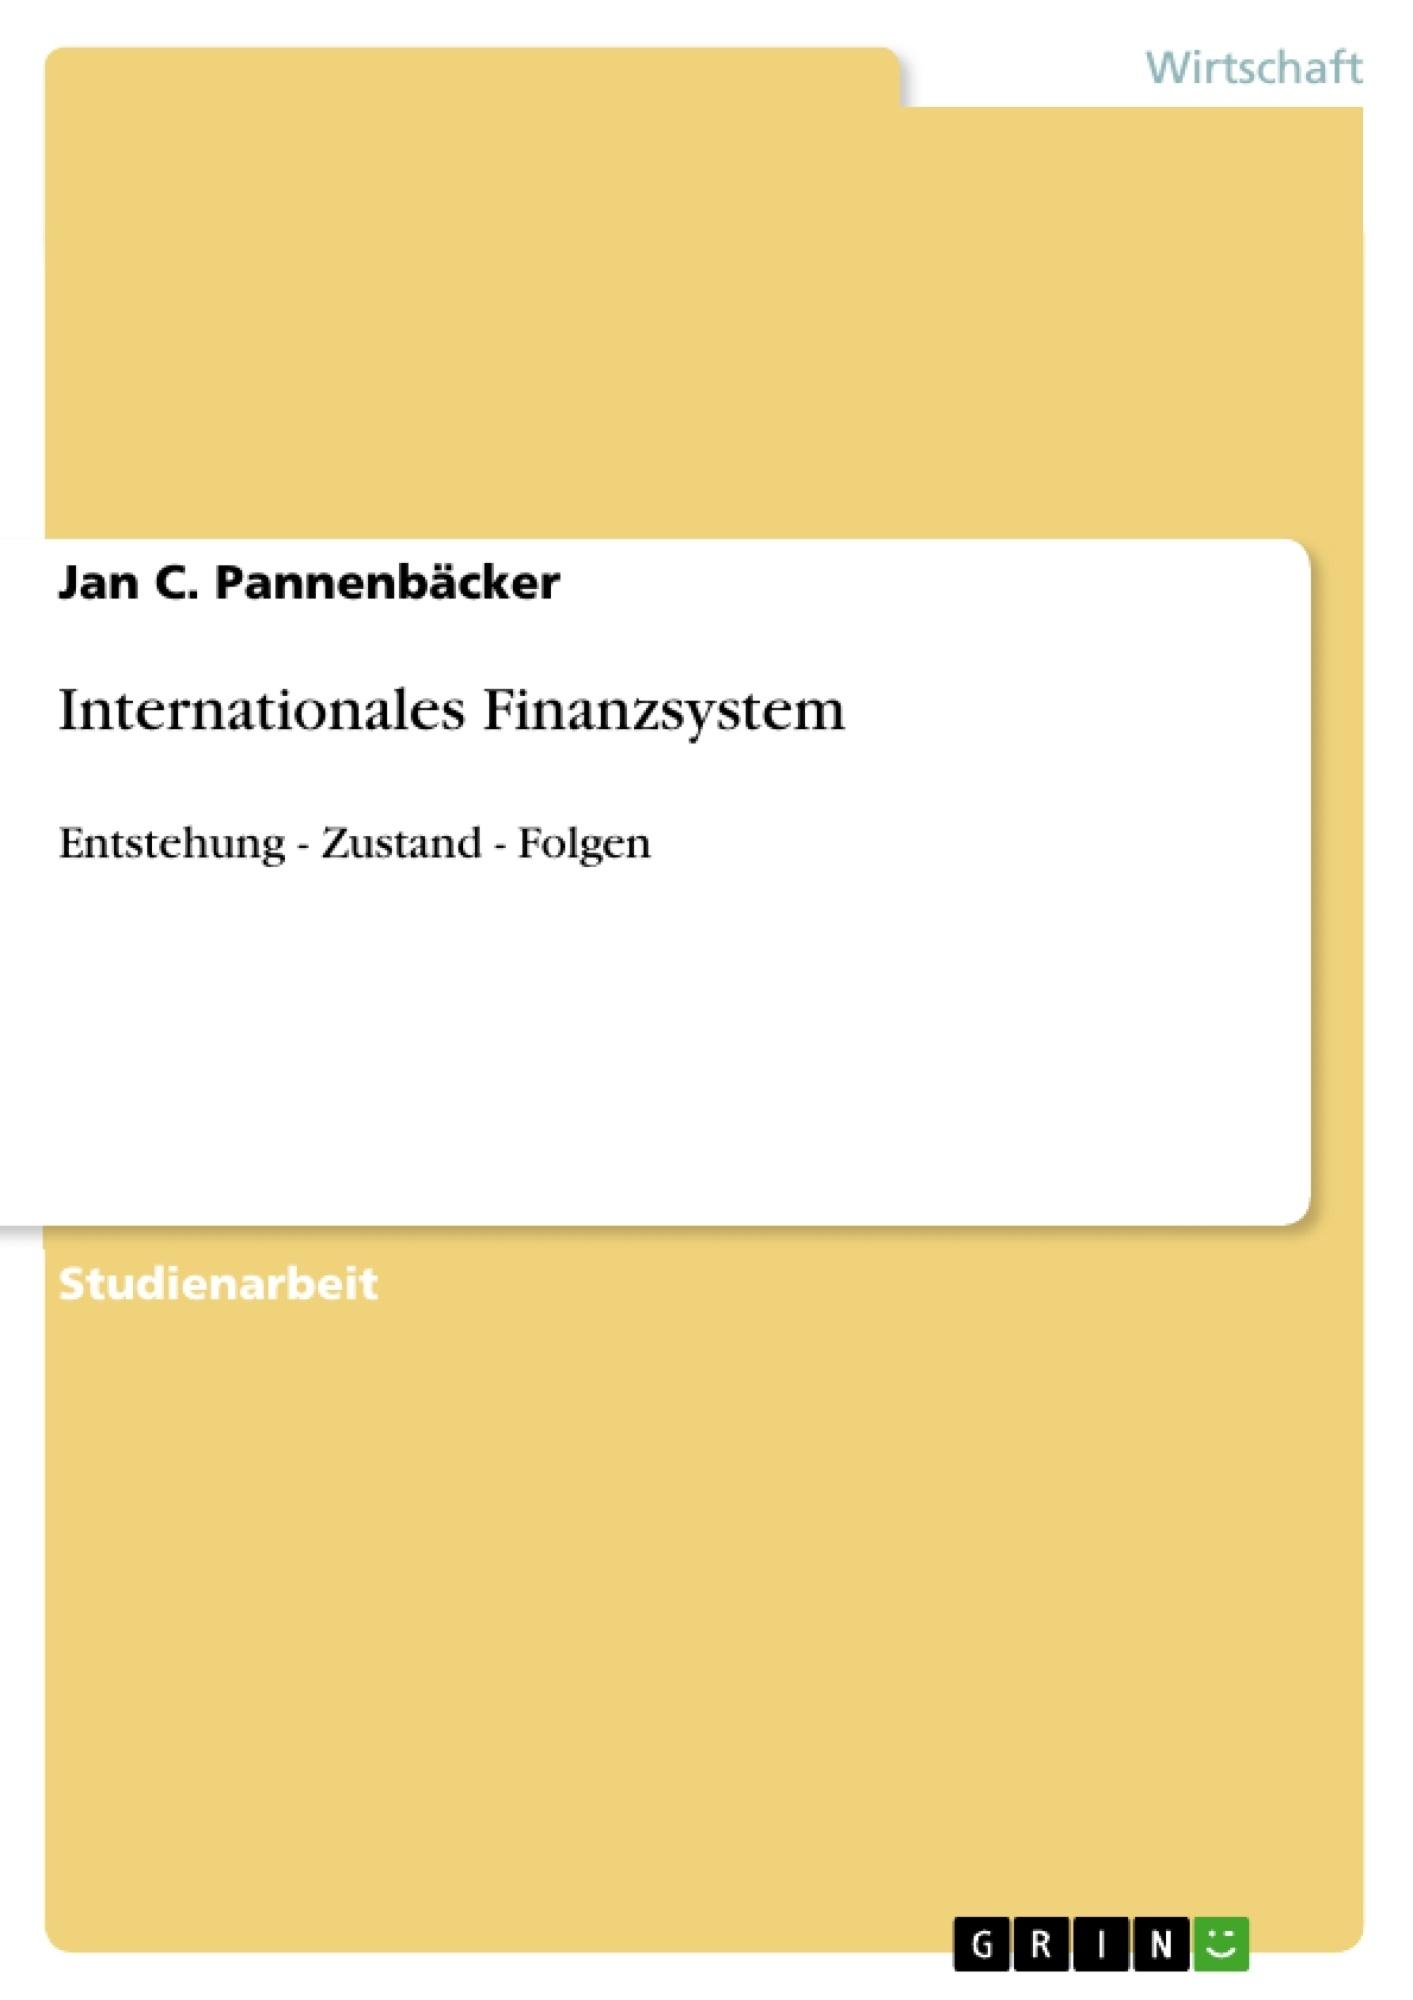 Titel: Internationales Finanzsystem